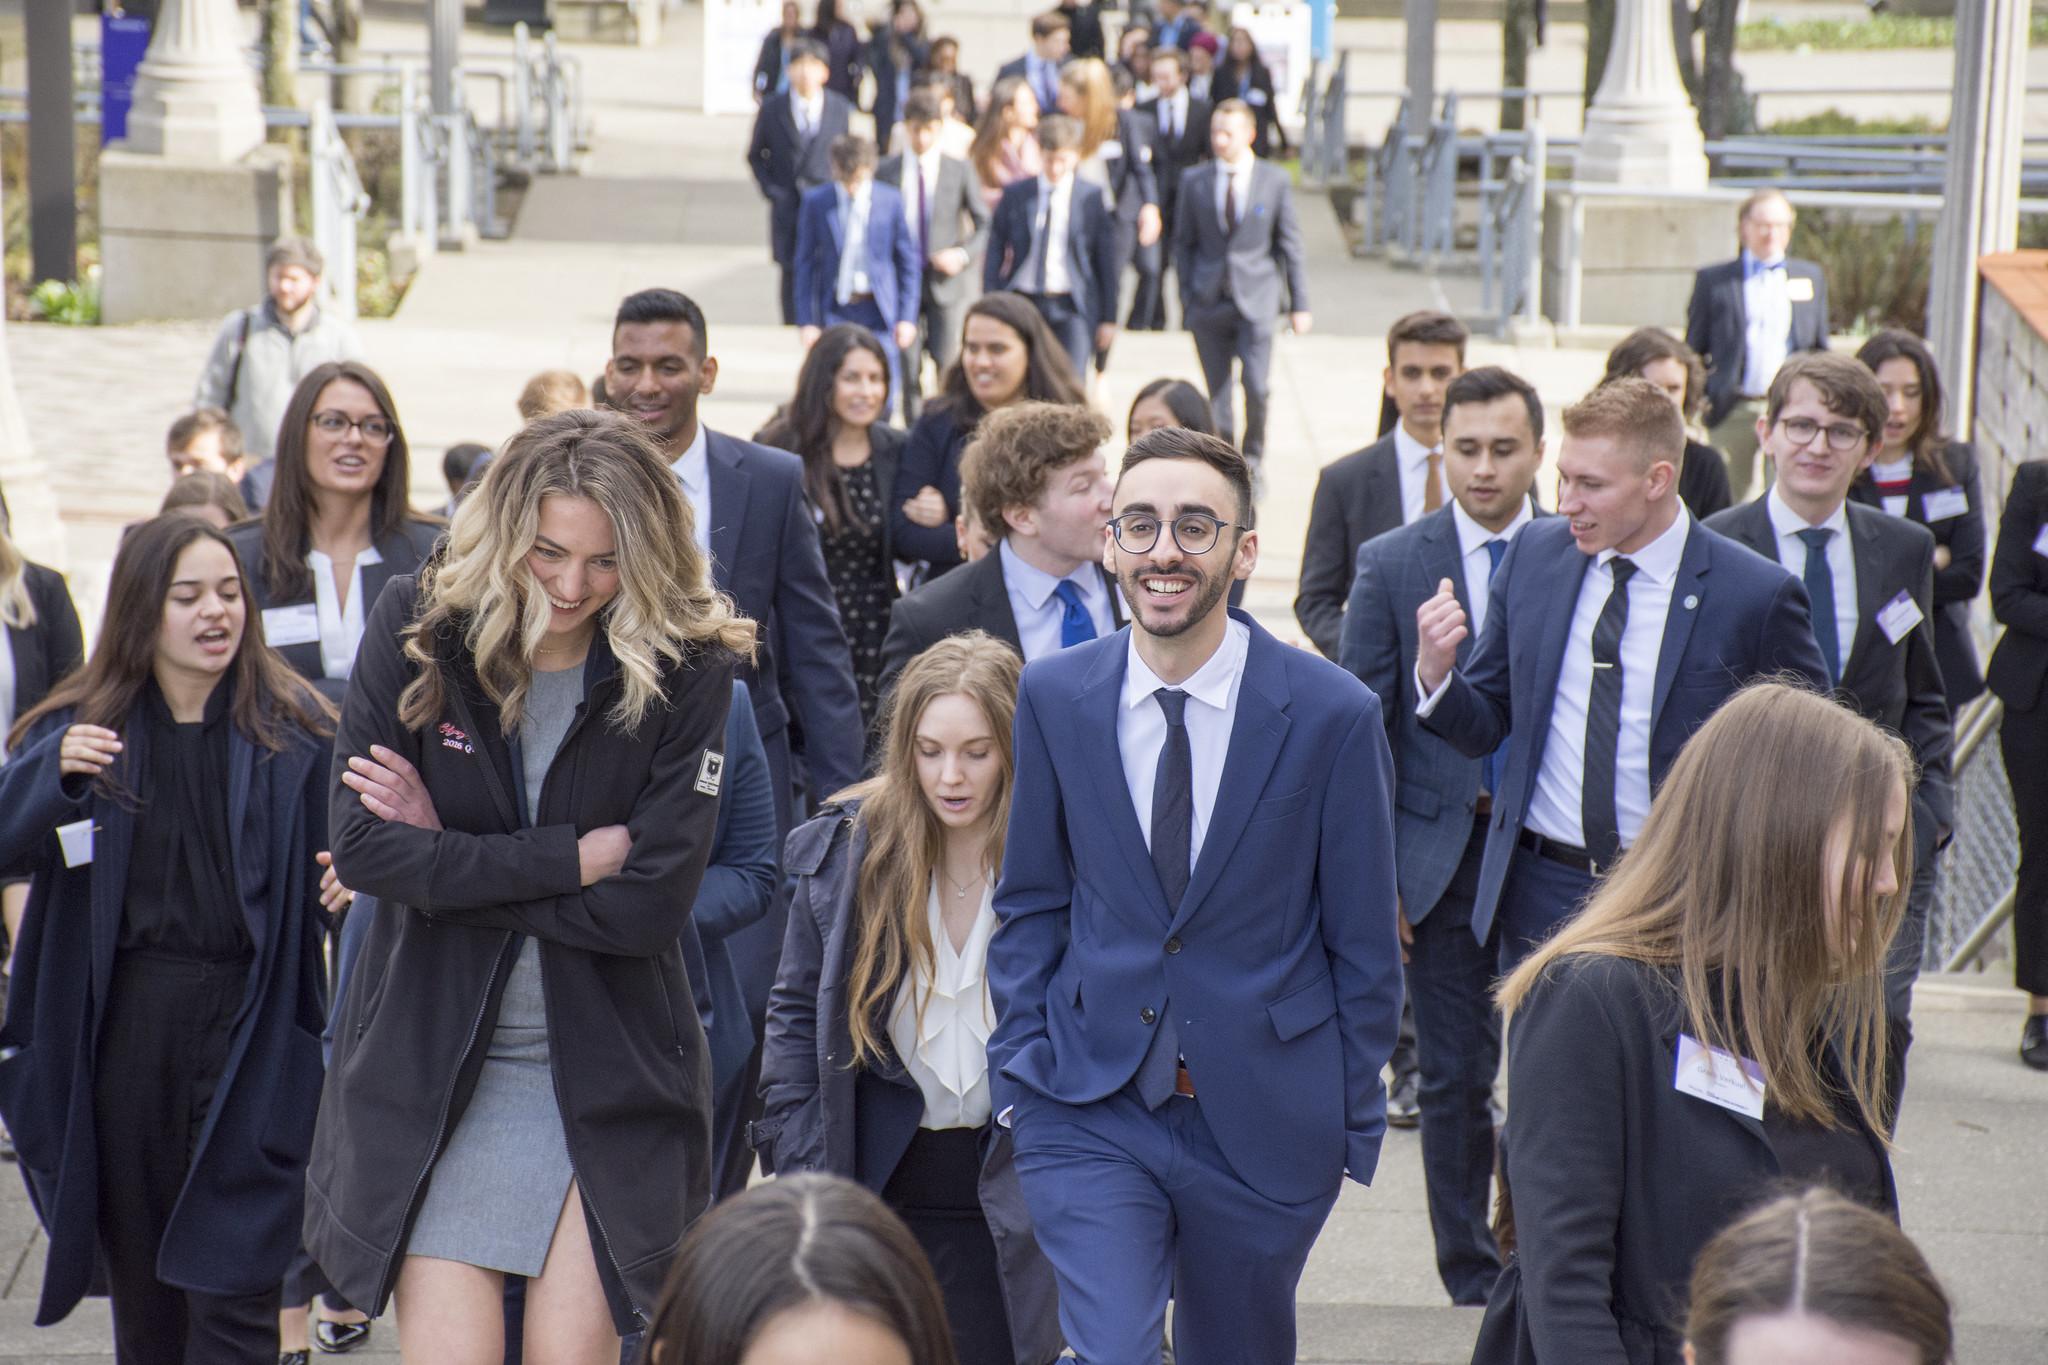 walking students